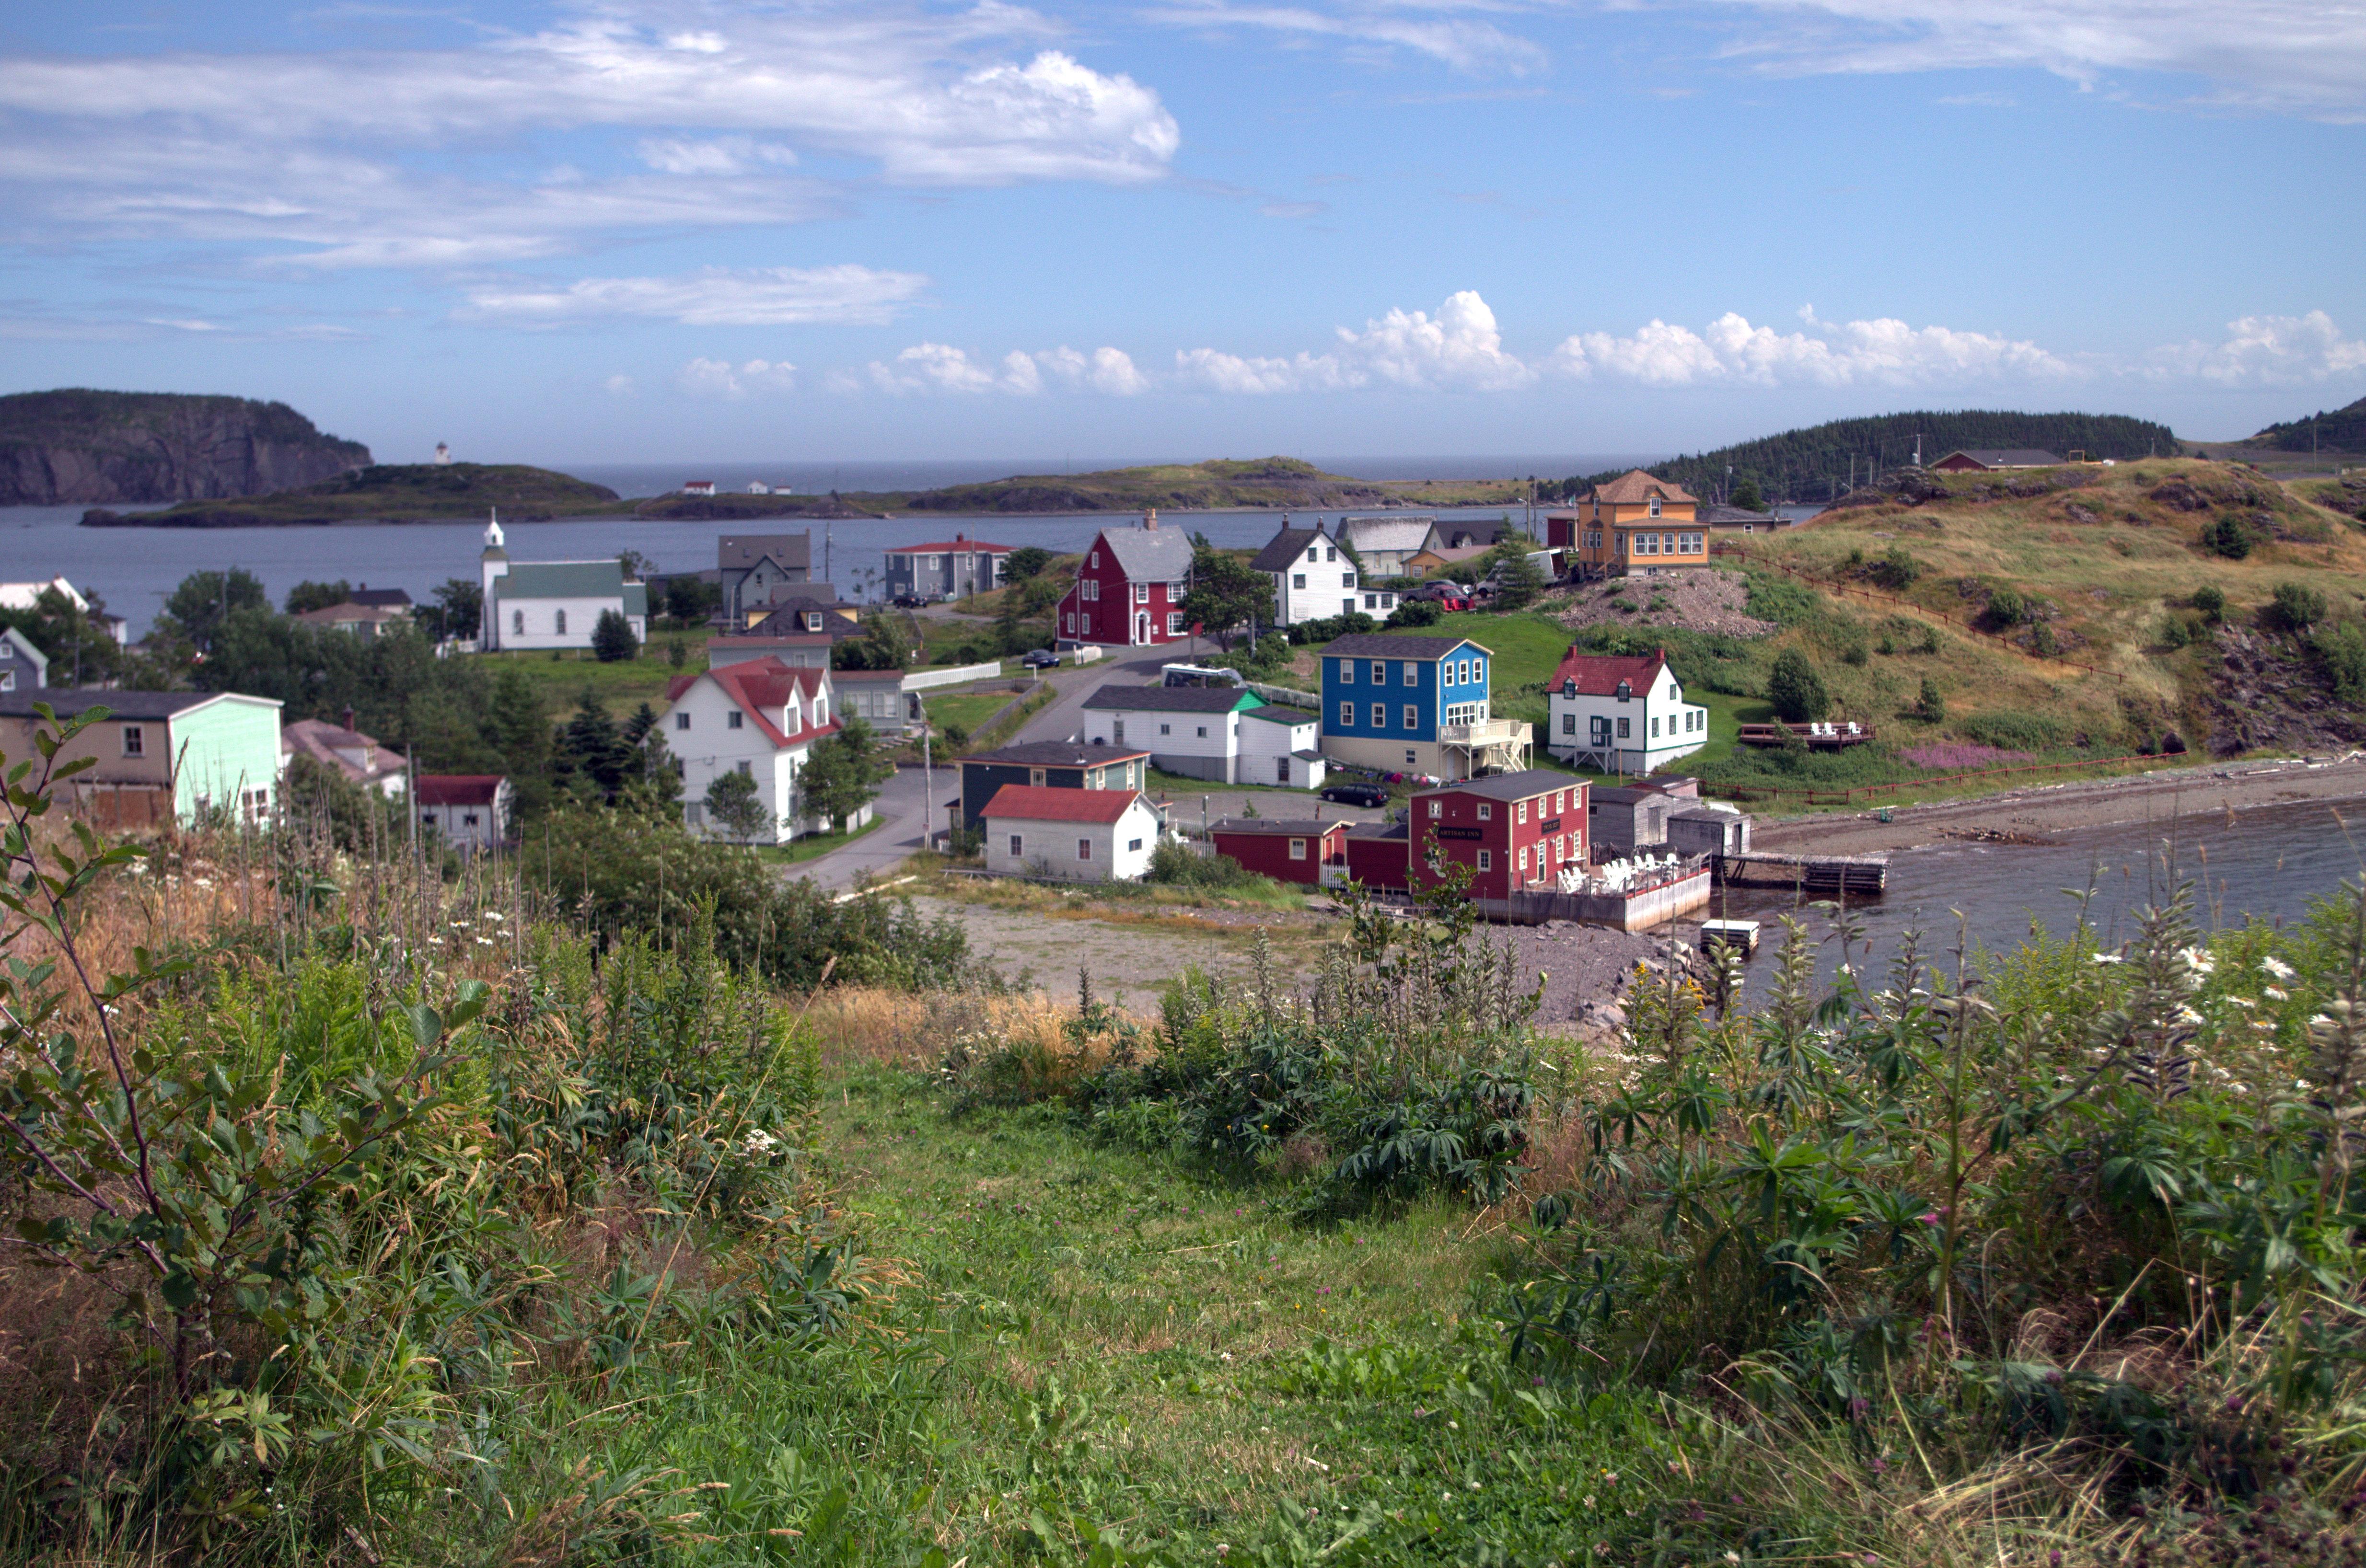 road map meaning with Bonavista Peninsula Newfoundland Southern Shore on 7466693510 as well Bonavista Peninsula Newfoundland Southern Shore as well Rosada Beach additionally Riding Shimanami Kaido further 21296890.